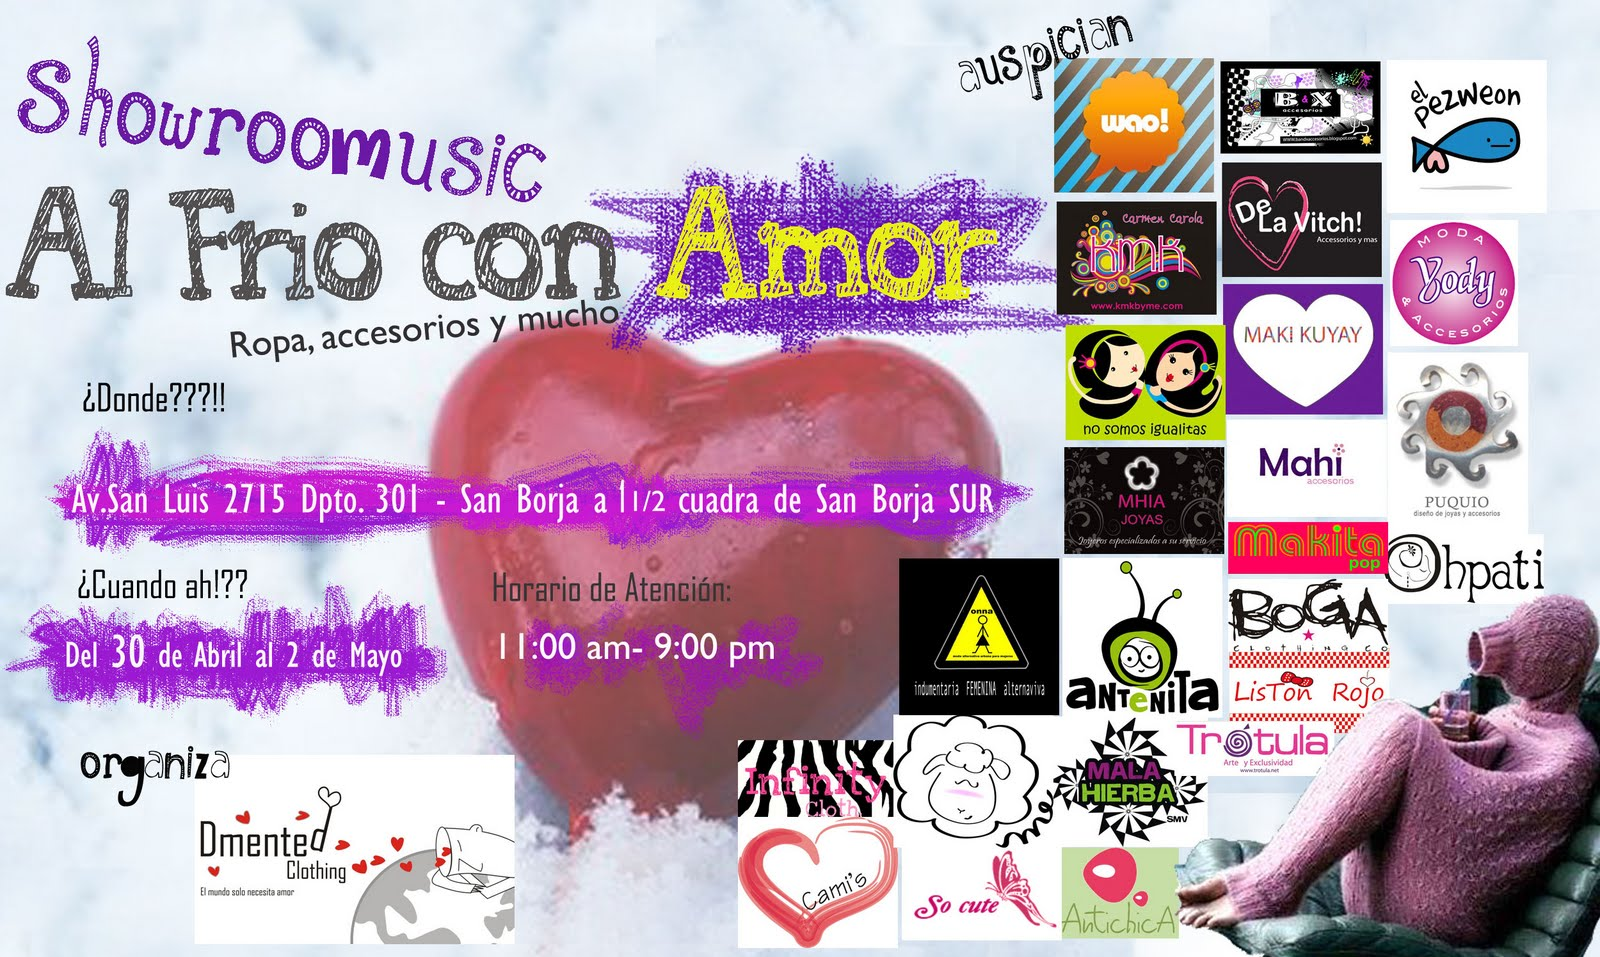 http://3.bp.blogspot.com/_ltK4Ho_WJ58/S8c8xqYfAoI/AAAAAAAAAB4/32eEiEMvfTg/s1600/Copia+de+AL-FRIO-CON-AMOR-cn-marcas-HIELO-CORAZON-ORIGINAL.jpg